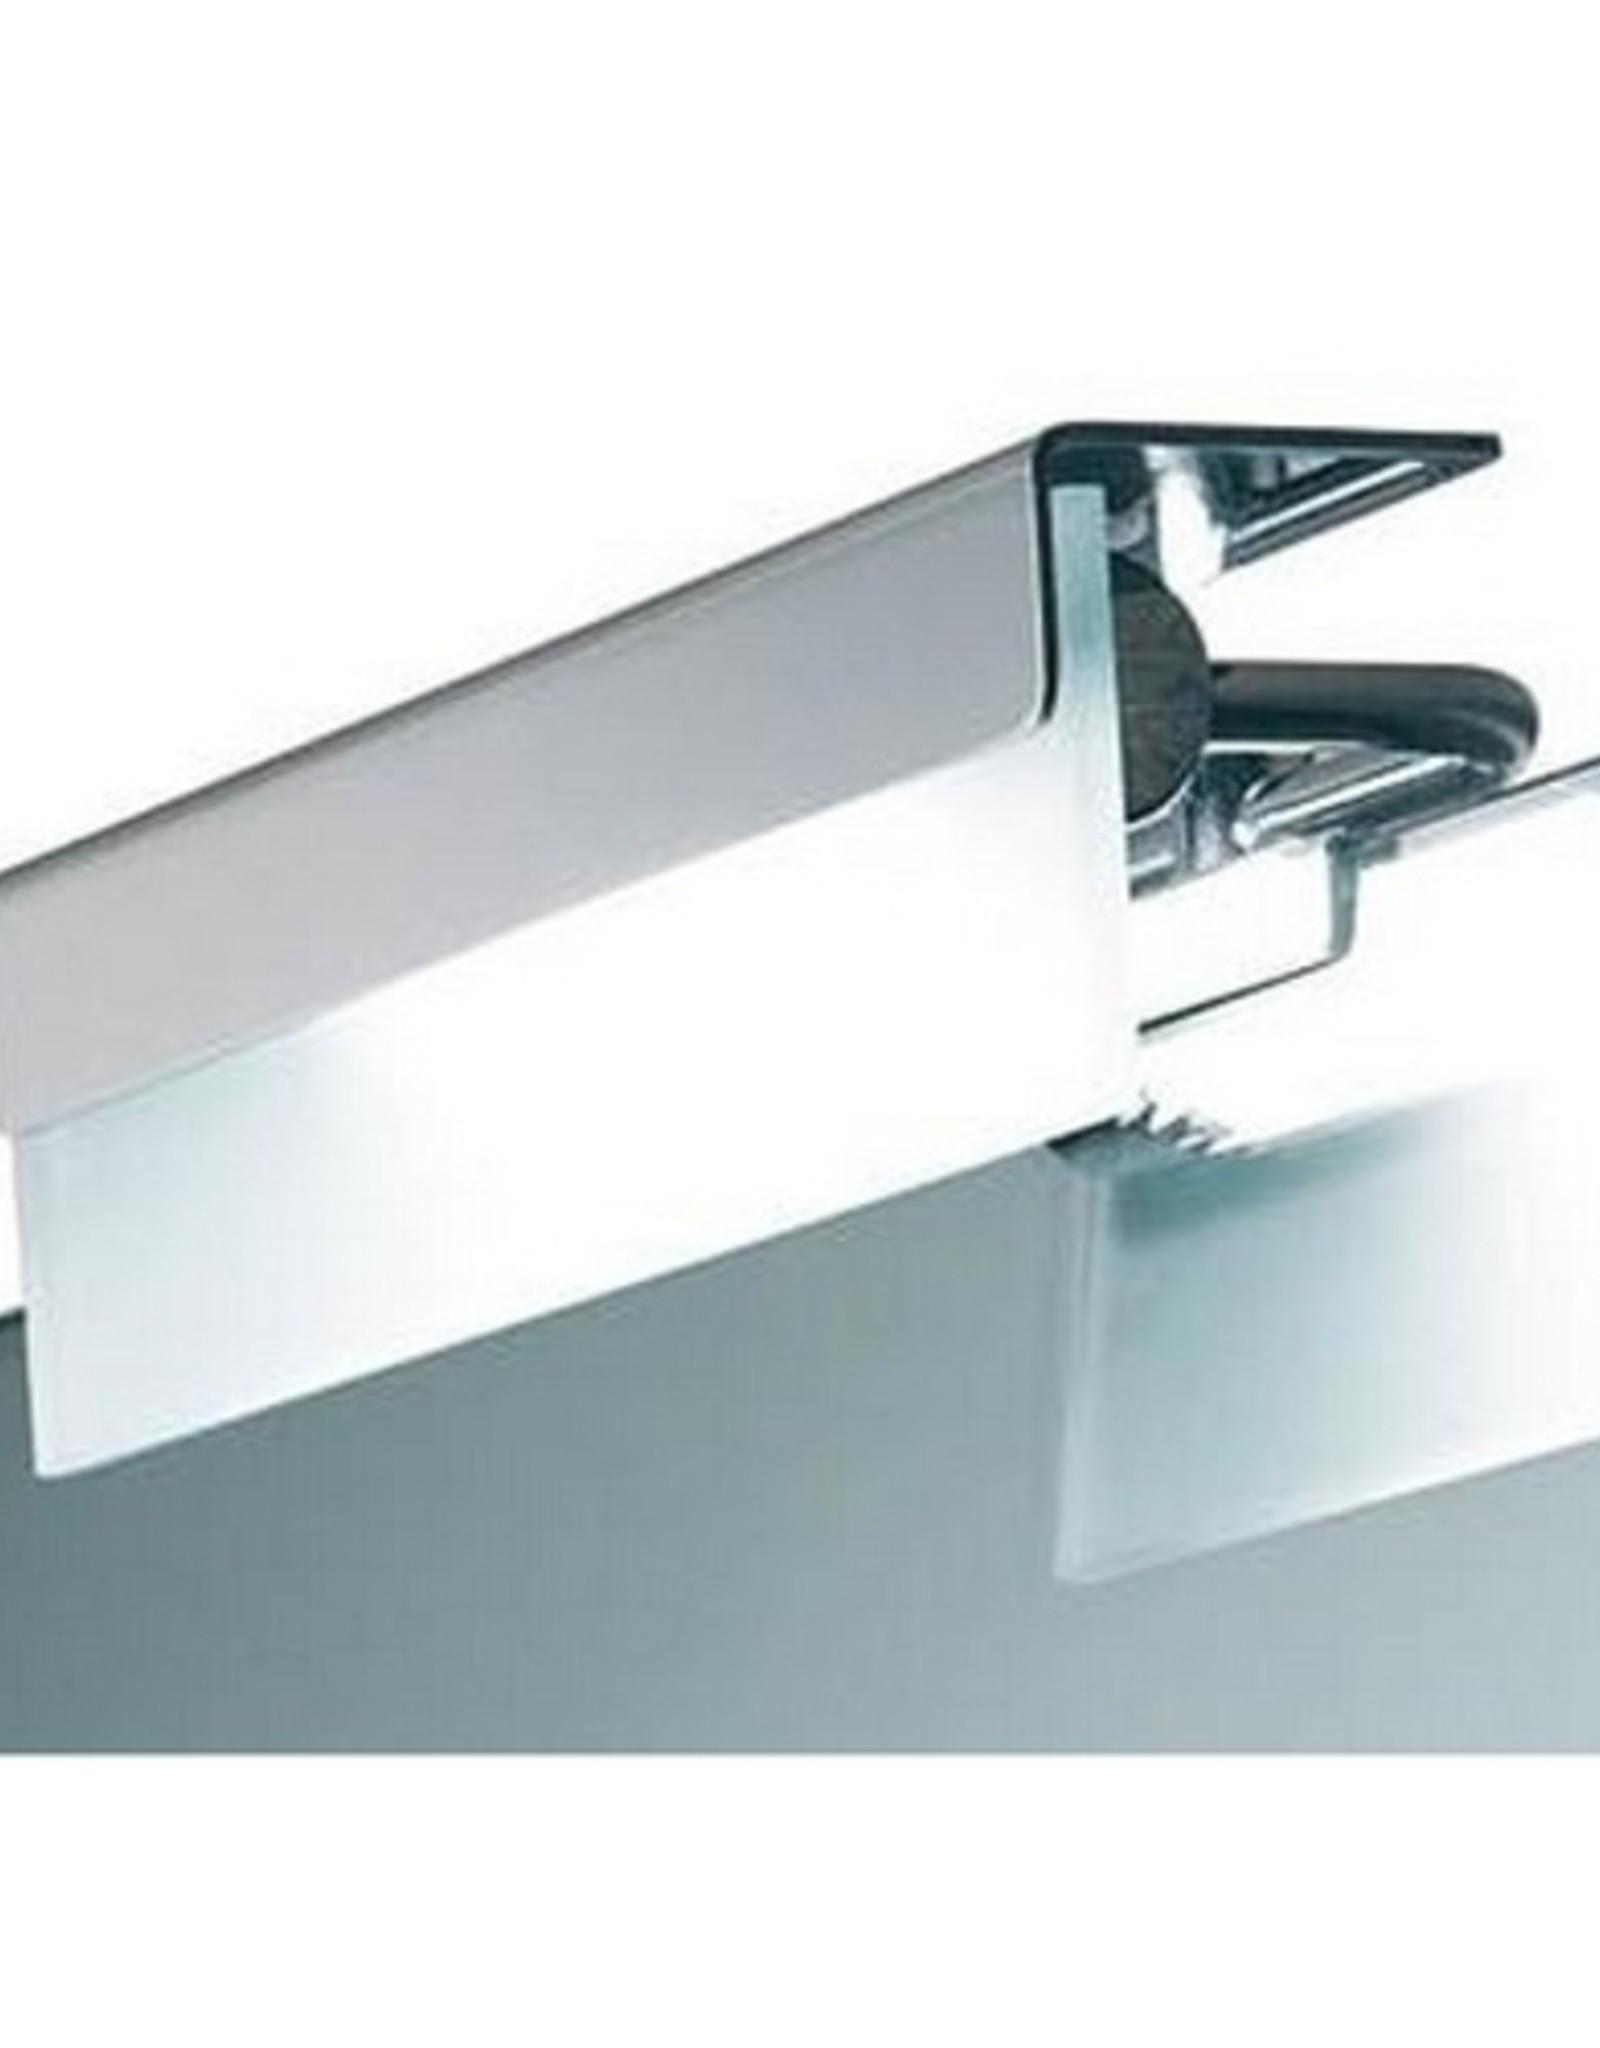 Ciari halogen mirror lamp - outlet